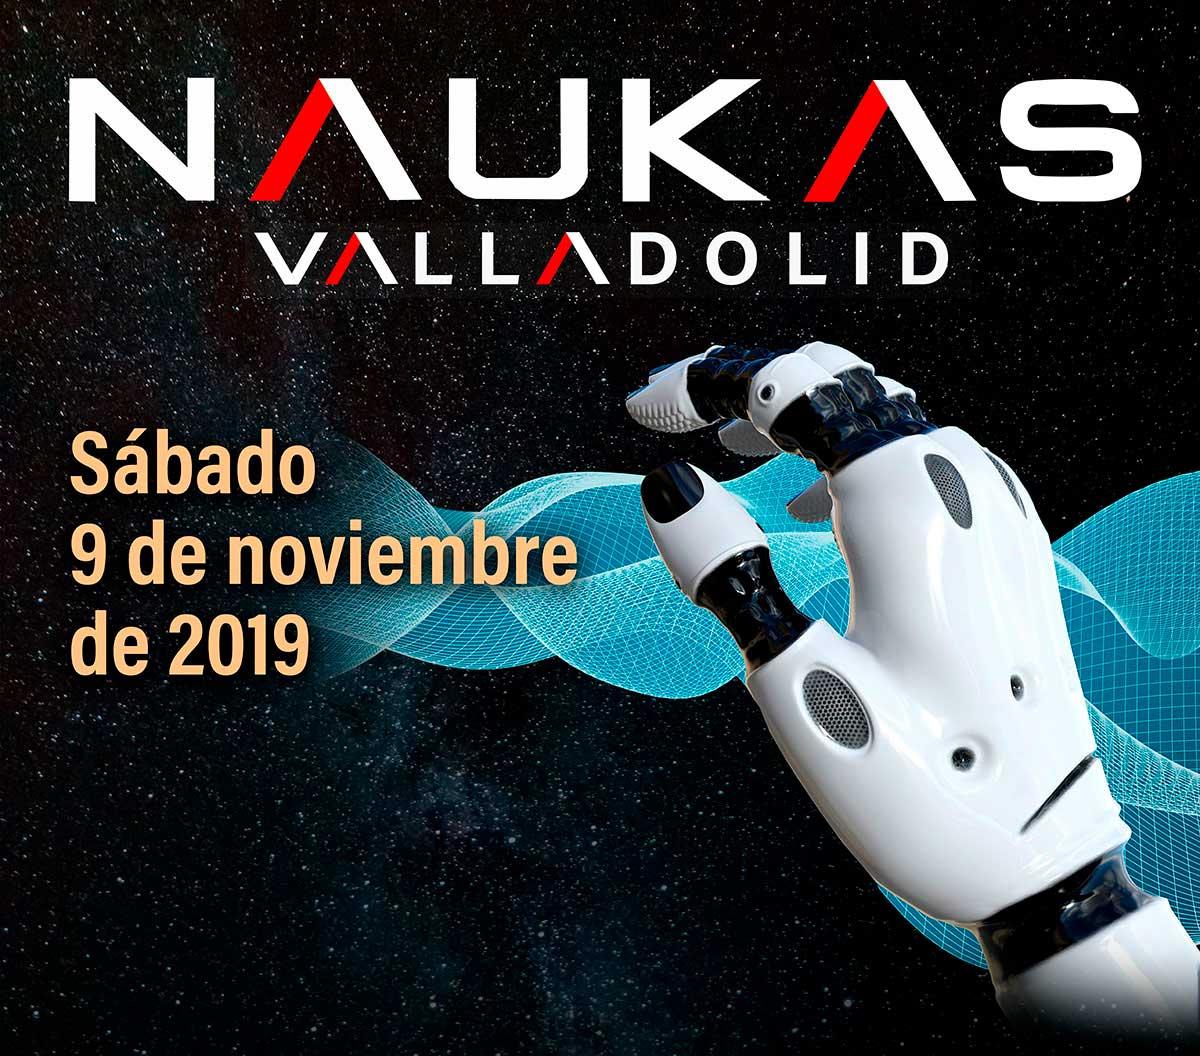 Programa (provisional) de Naukas Valladolid 2019 (Teatro Zorrilla, sábado 09 noviembre)